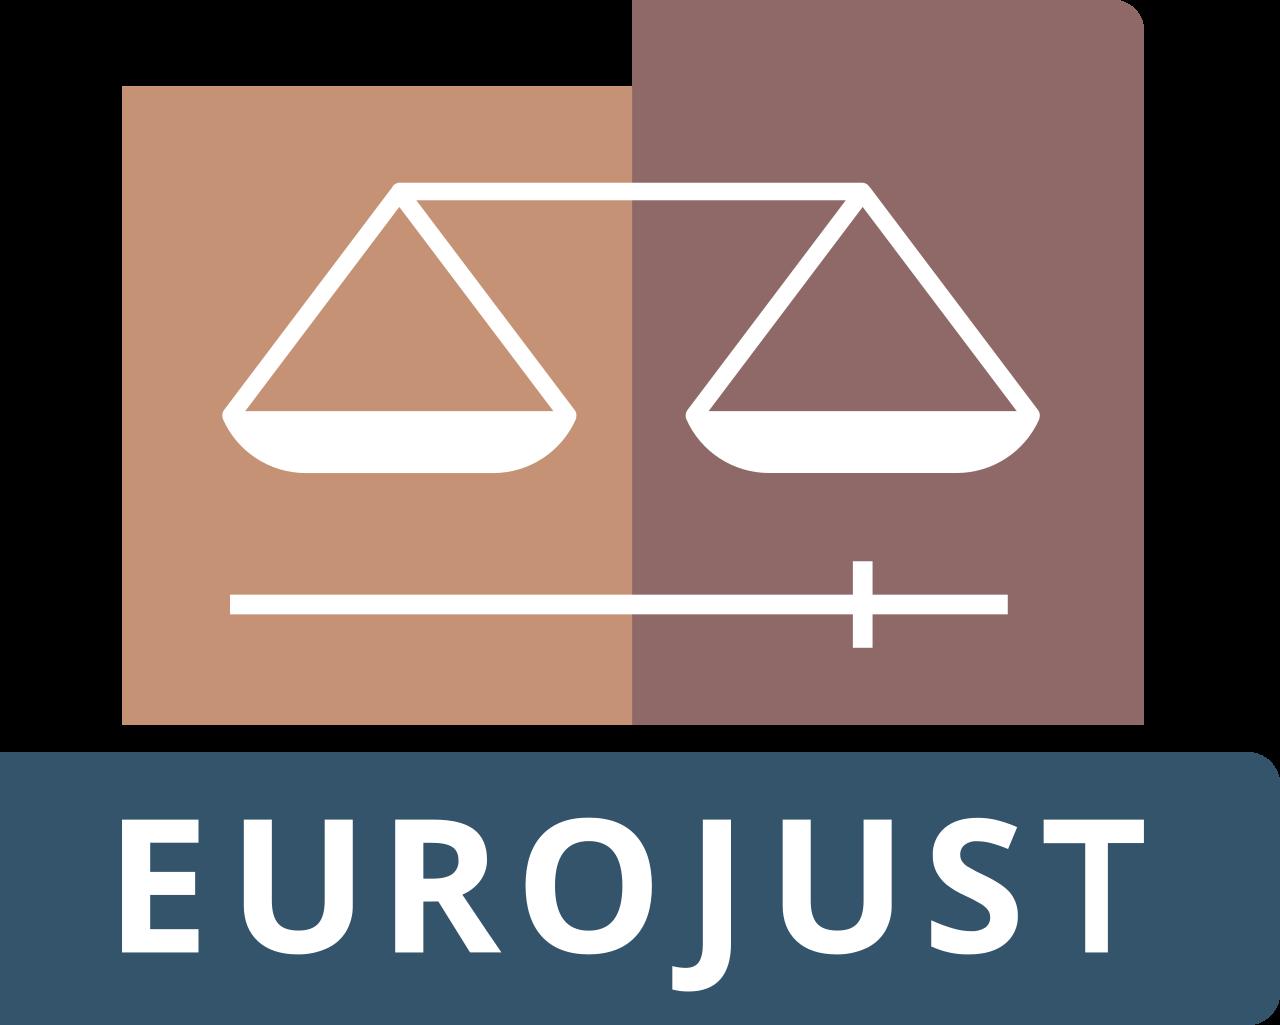 eurojust.europa.eu